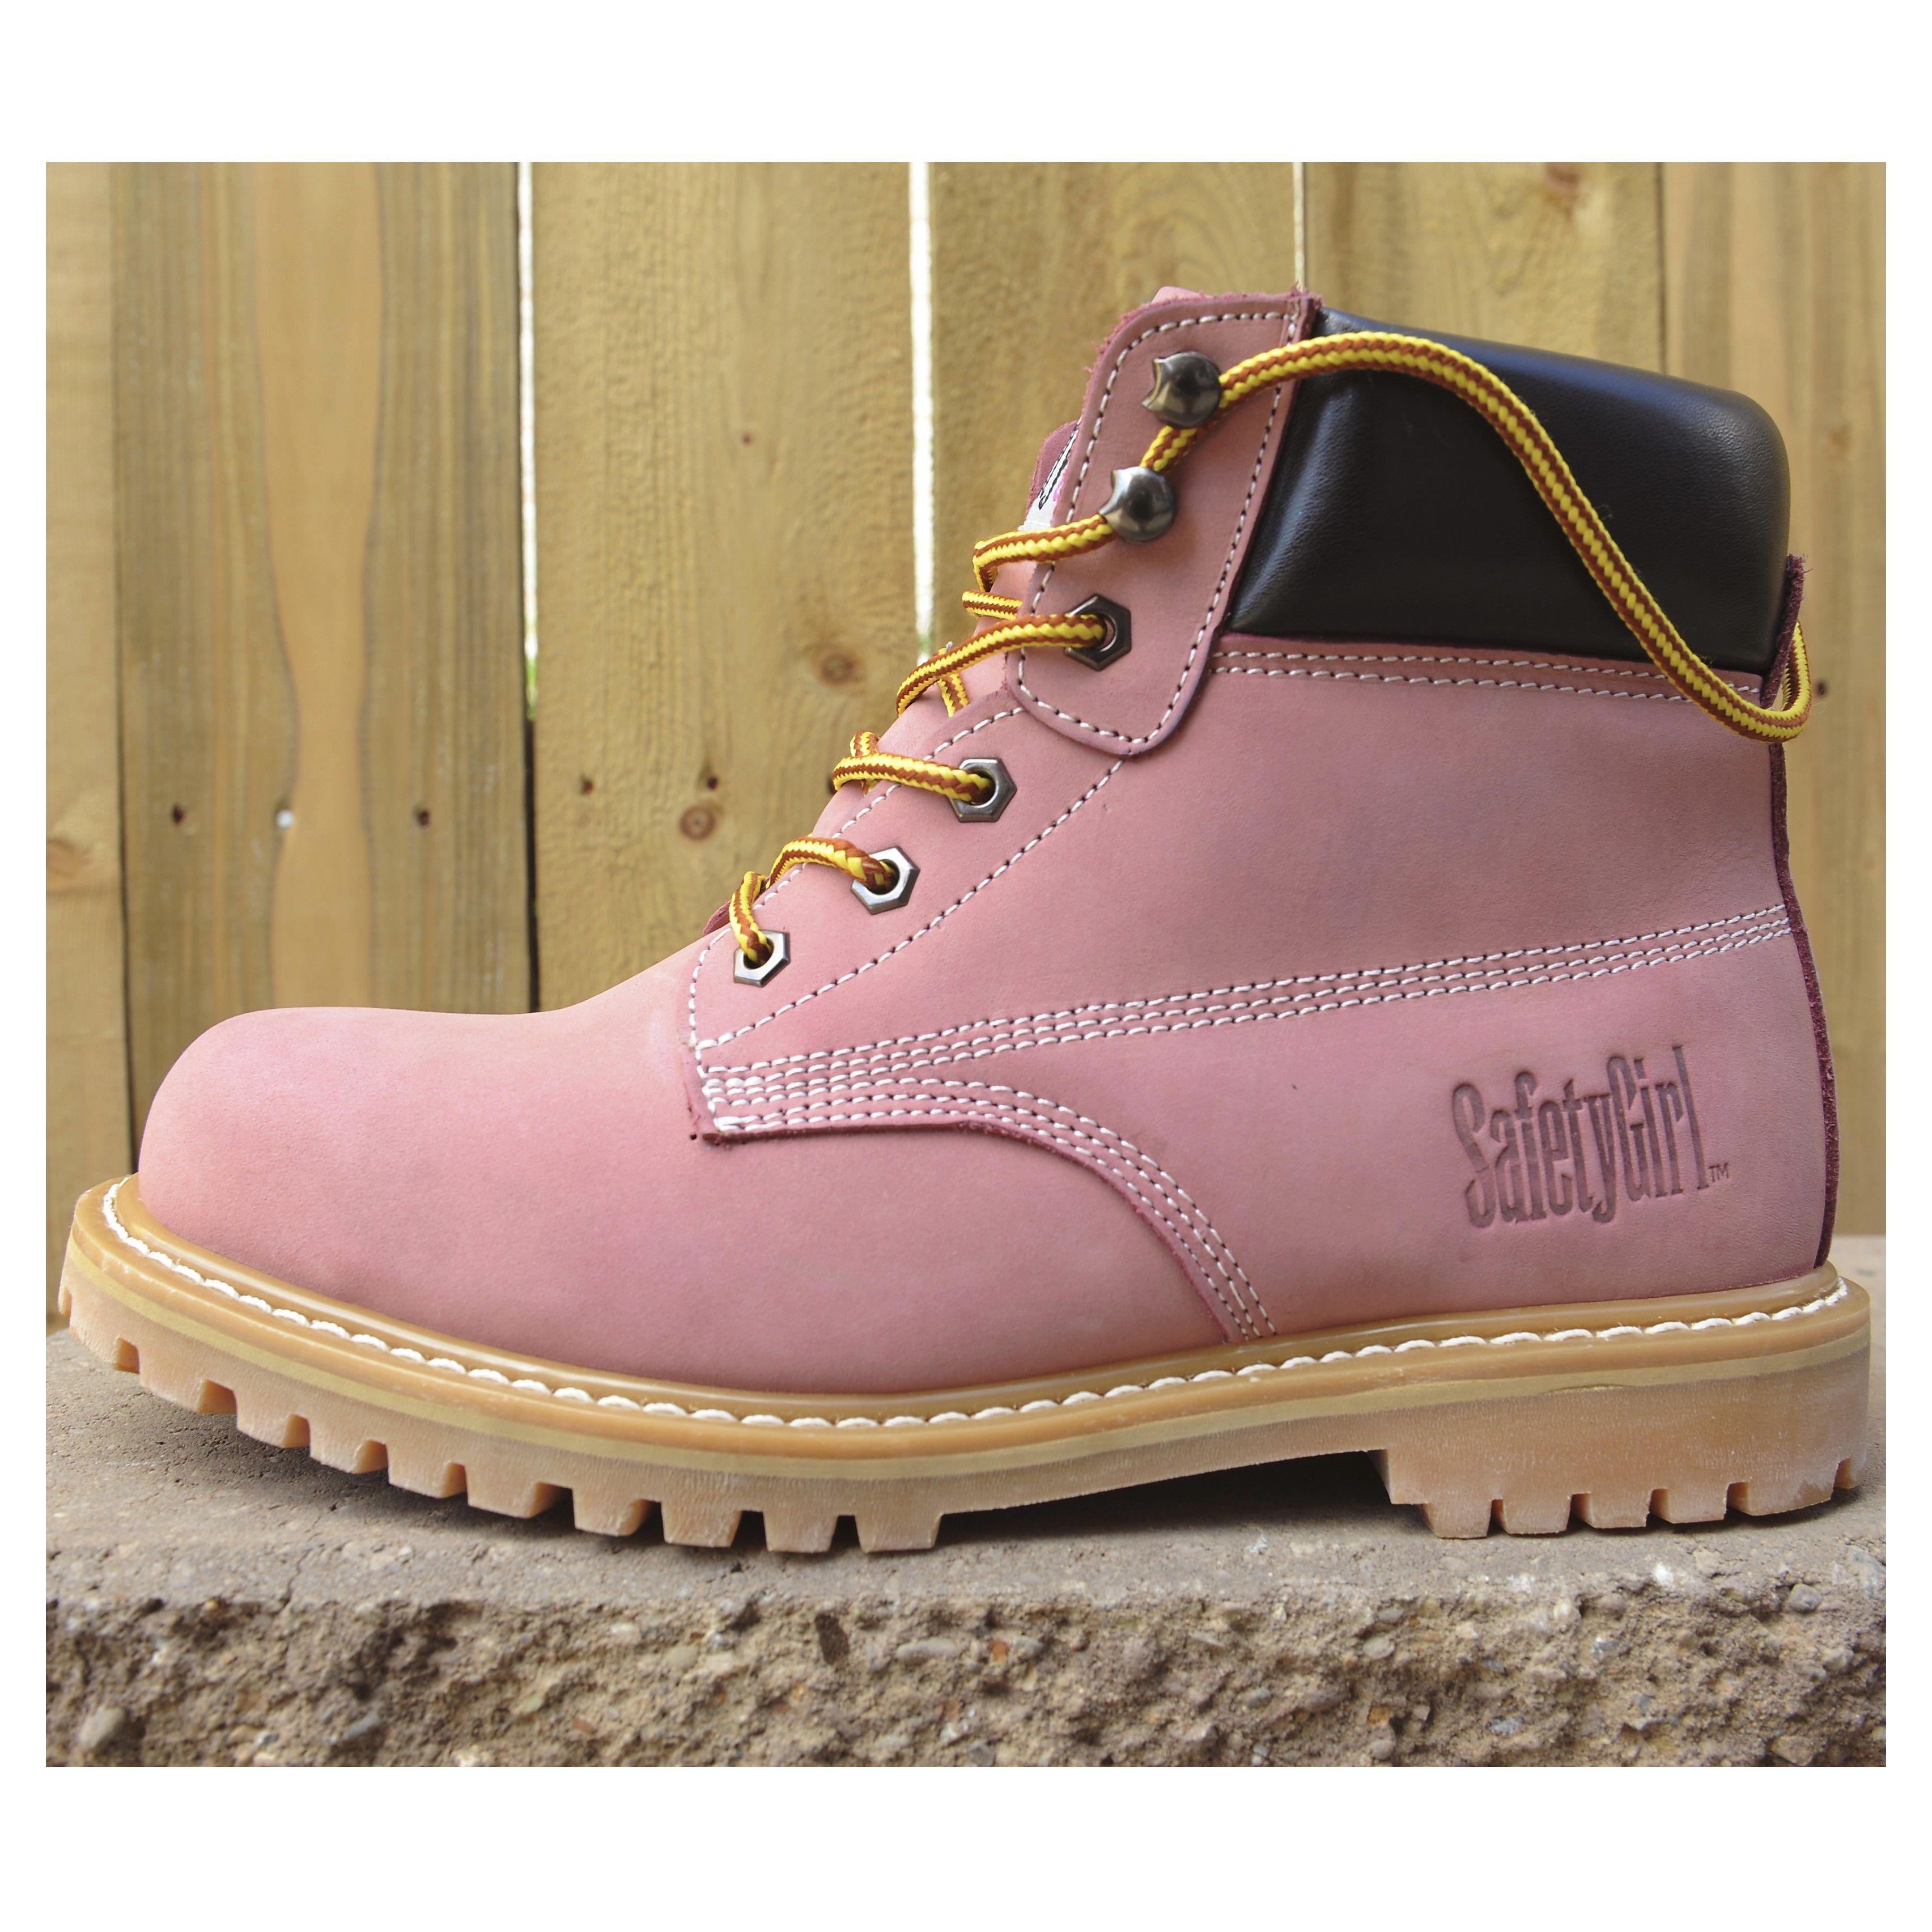 SafetyGirl Steel Toe WaterProof Womens Work Boot Boots